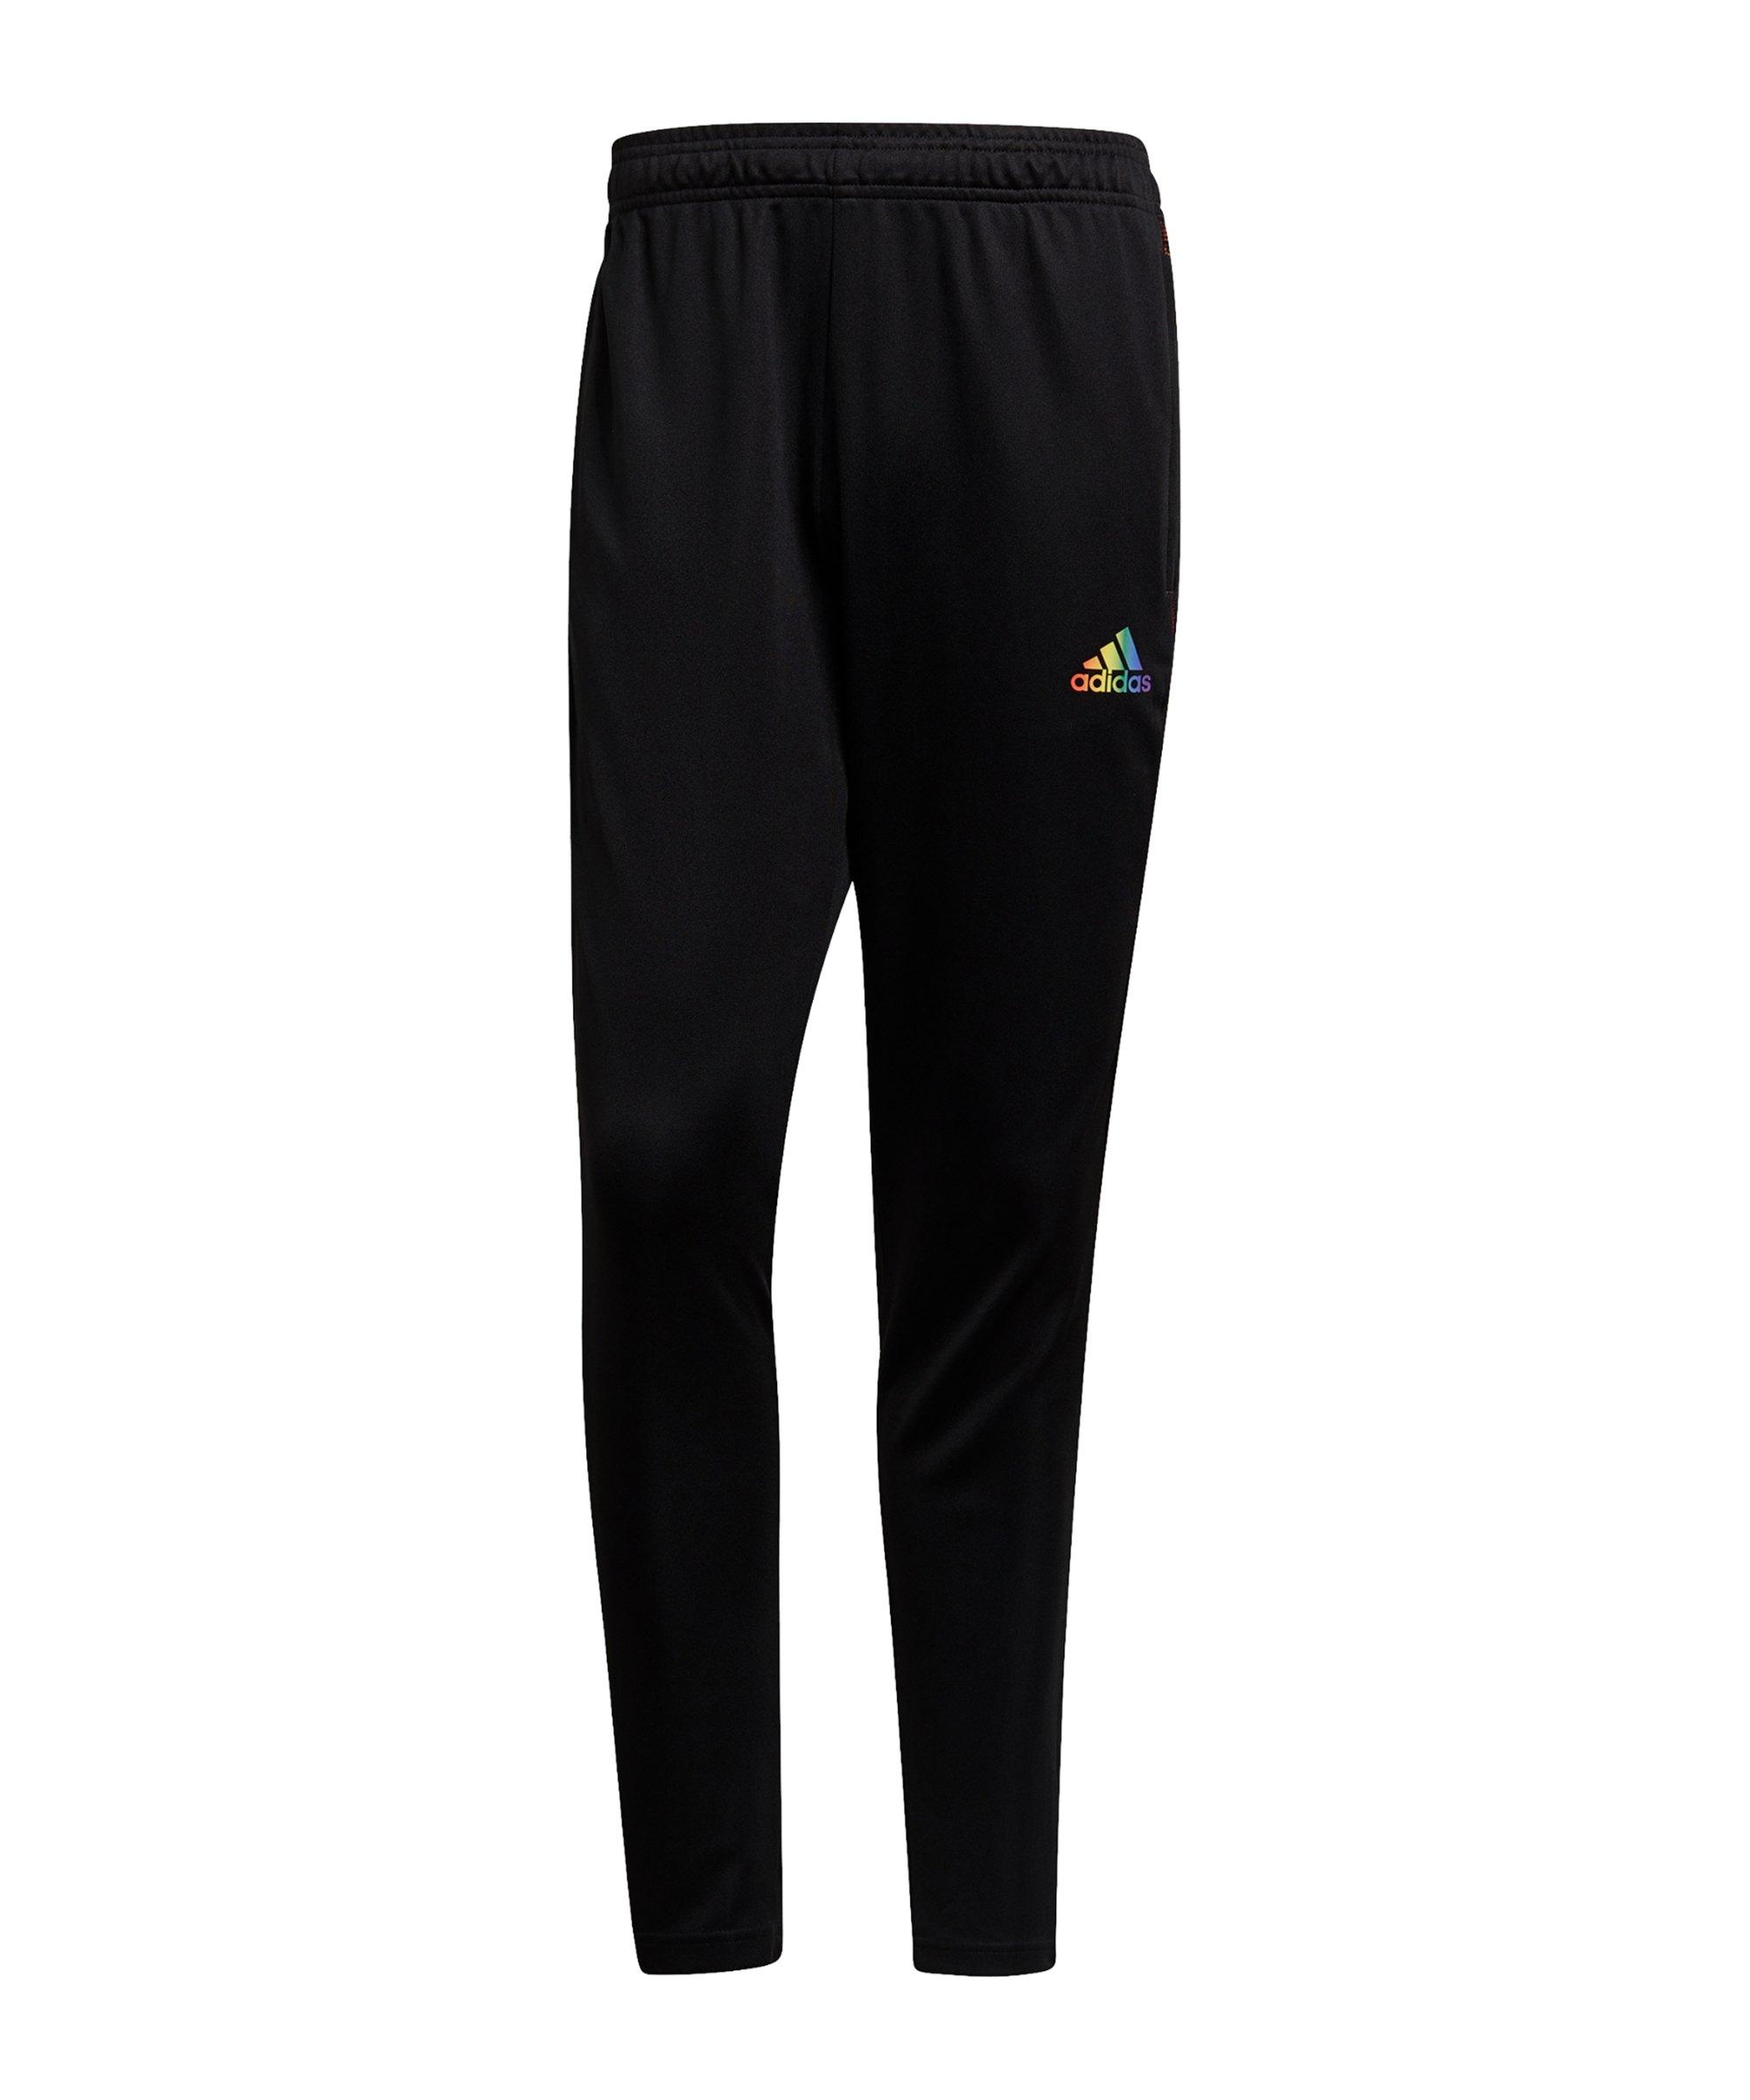 adidas Tiro Pride Trainingshose Schwarz - schwarz